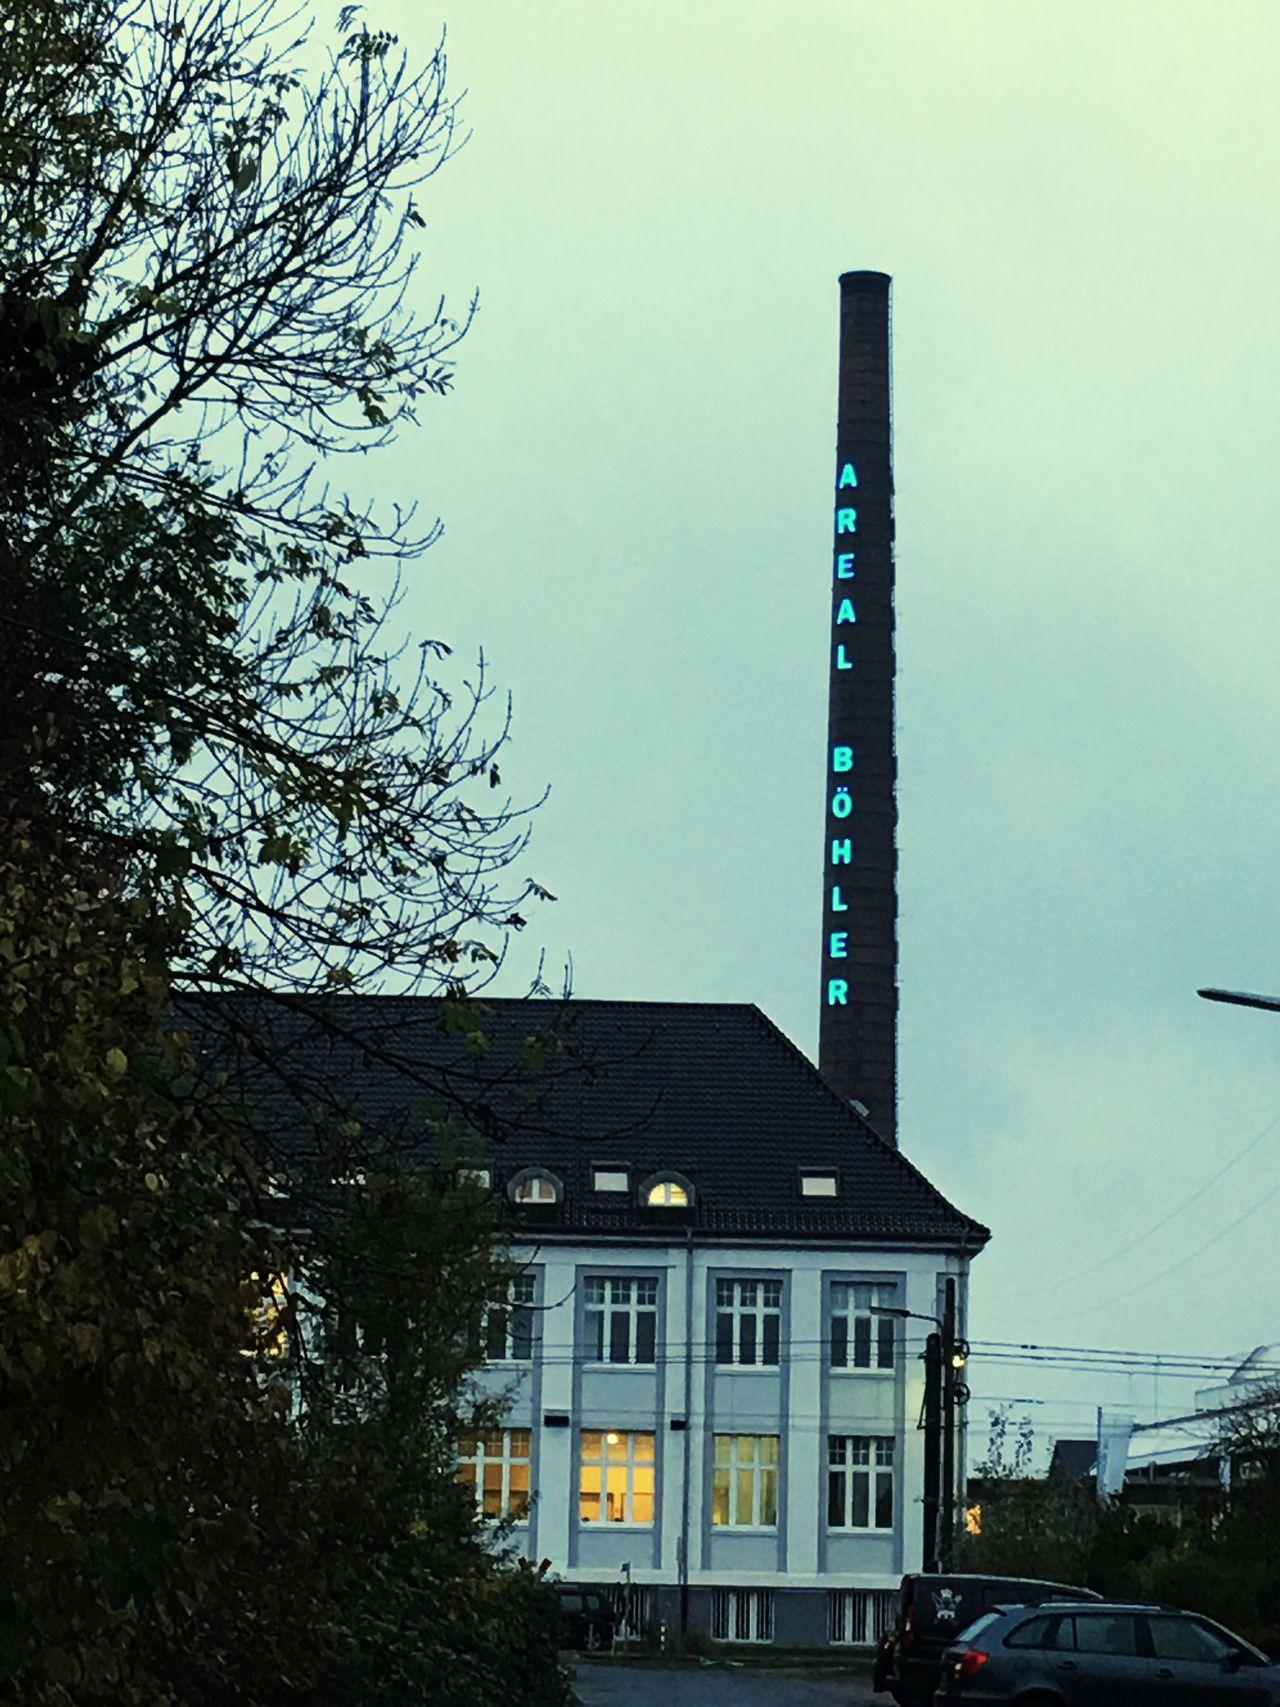 Böhler Werke⭐️ Böhler Düsseldorf🌾 Böhler🌾 Architecture Building Exterior Built Structure Clear Sky Sky City Outdoors No People Tree Modern Skyscraper Day (null)Fabrik Fabrique Event Messe Düsseldorf Meerbusch Meerbusch Düsseldorf